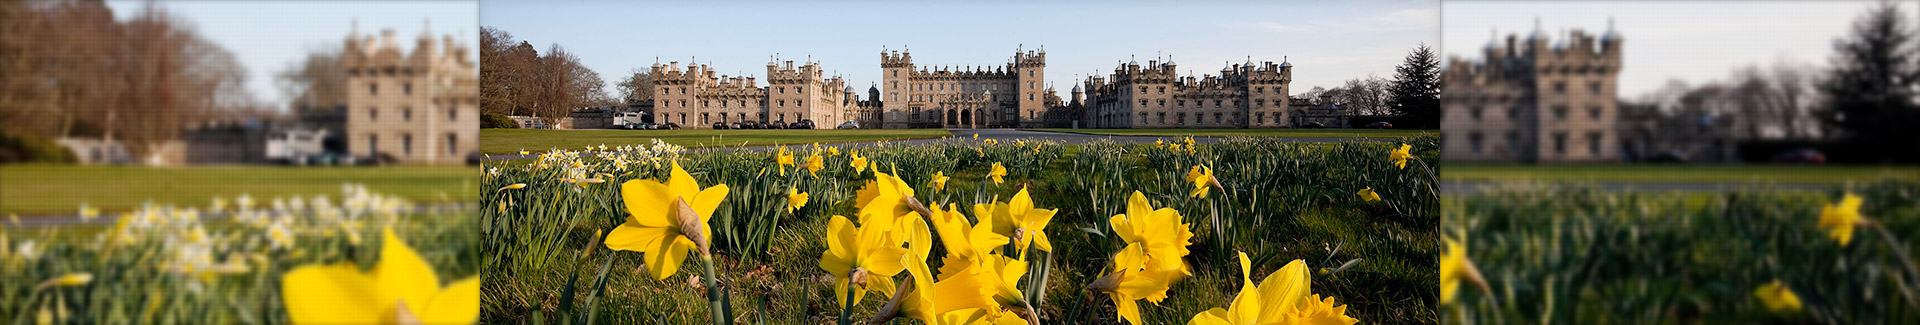 scotland_castles